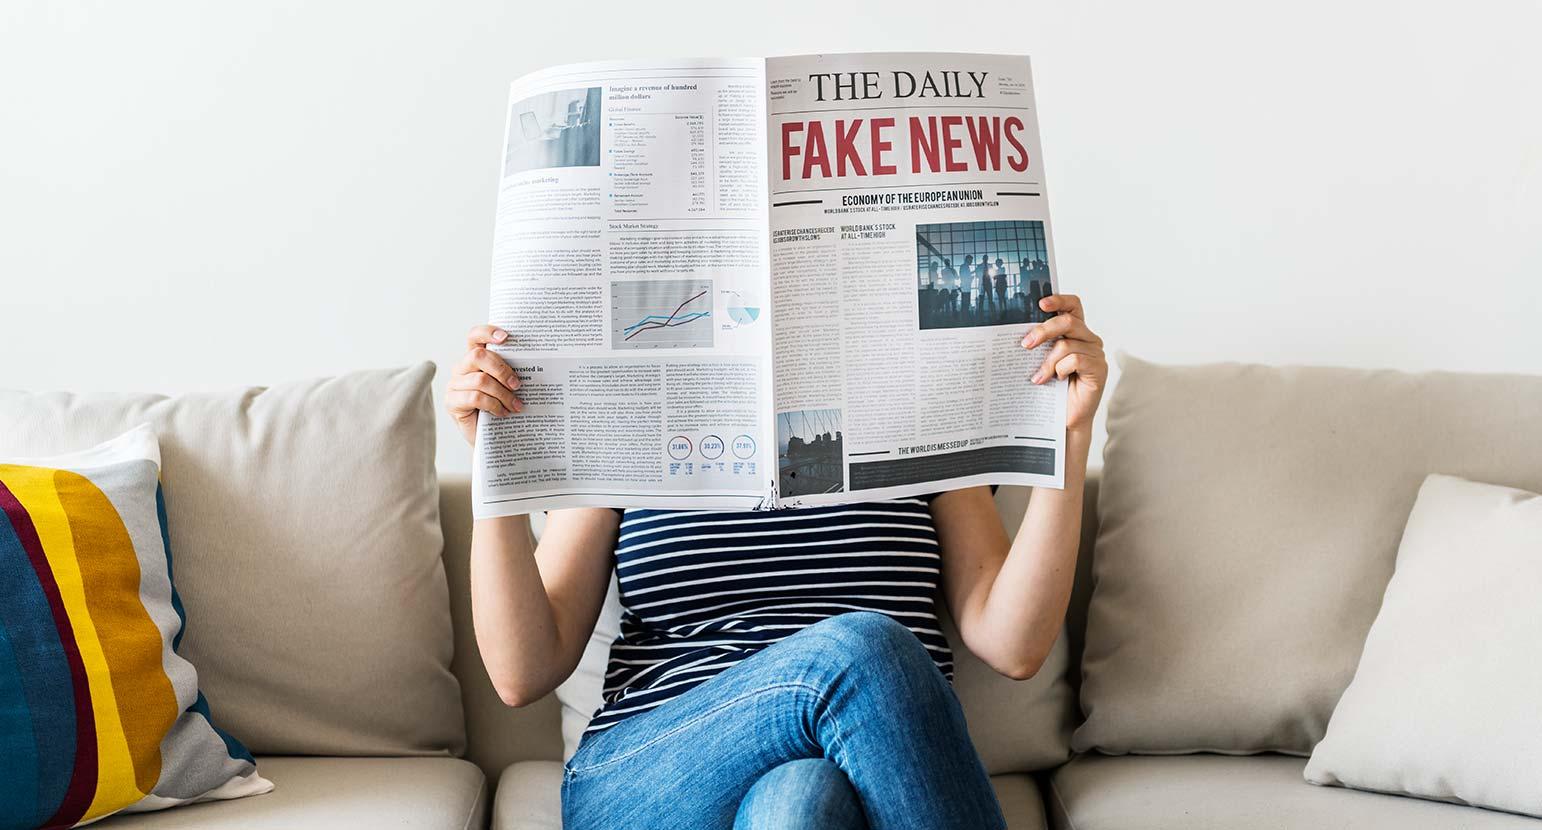 Woman reading newspaper with fake news headline